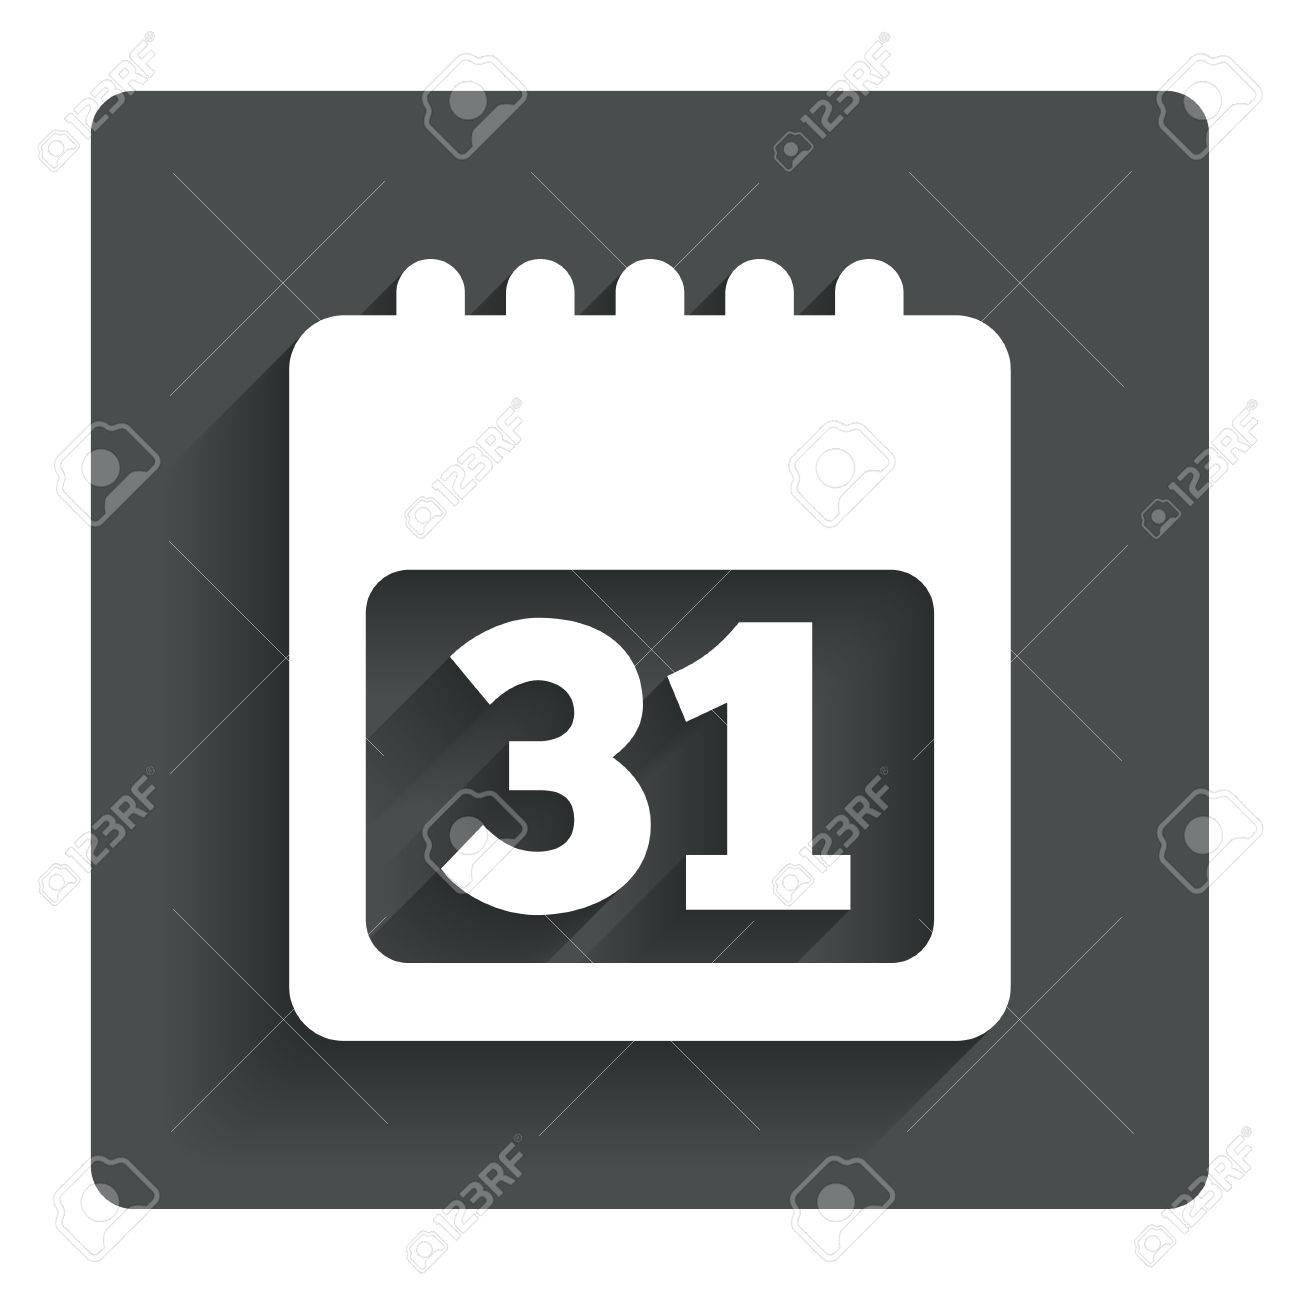 Calendar sign icon. 31 day month symbol. Stock Vector - 30654131